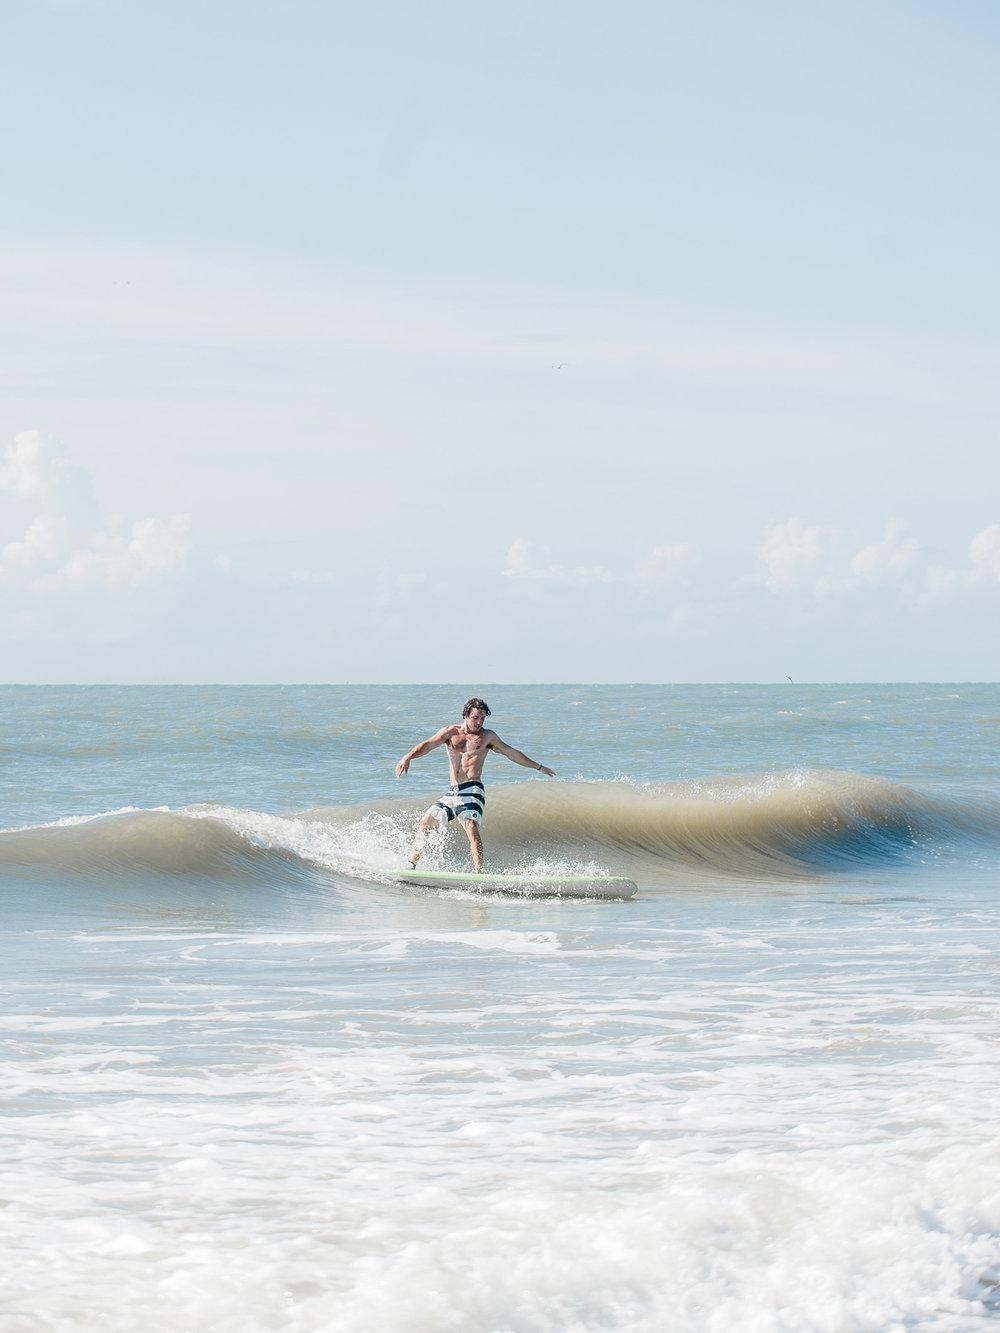 Gabe shredding in his surf lesson.